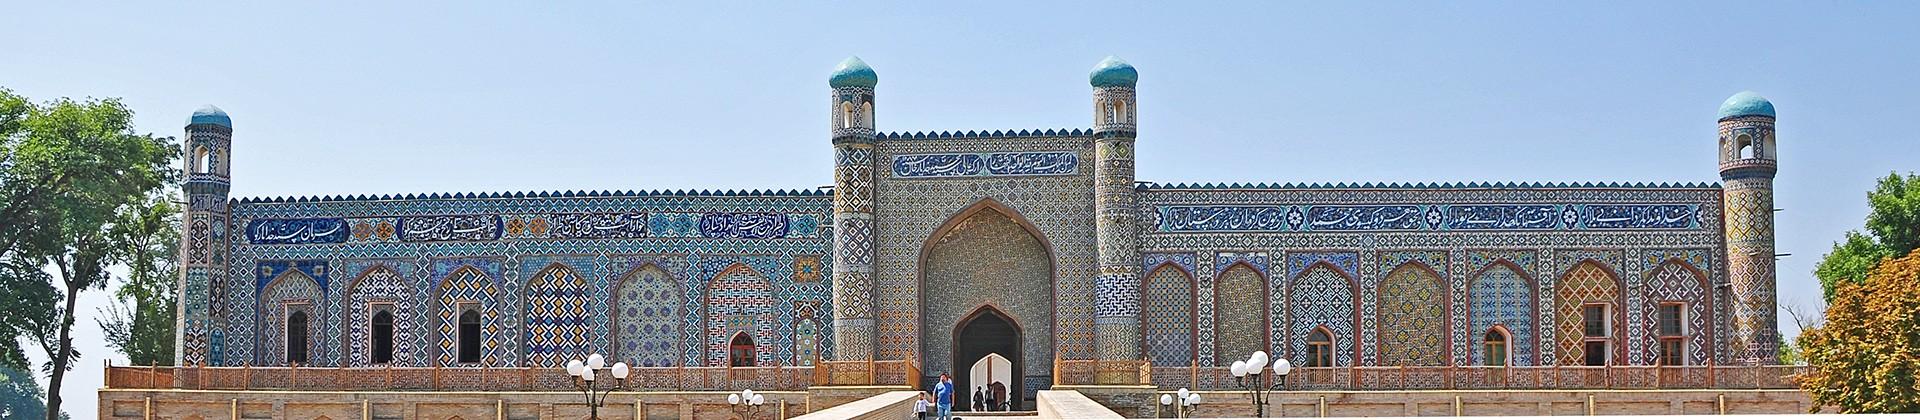 Khudoyar Khan Palace - 1